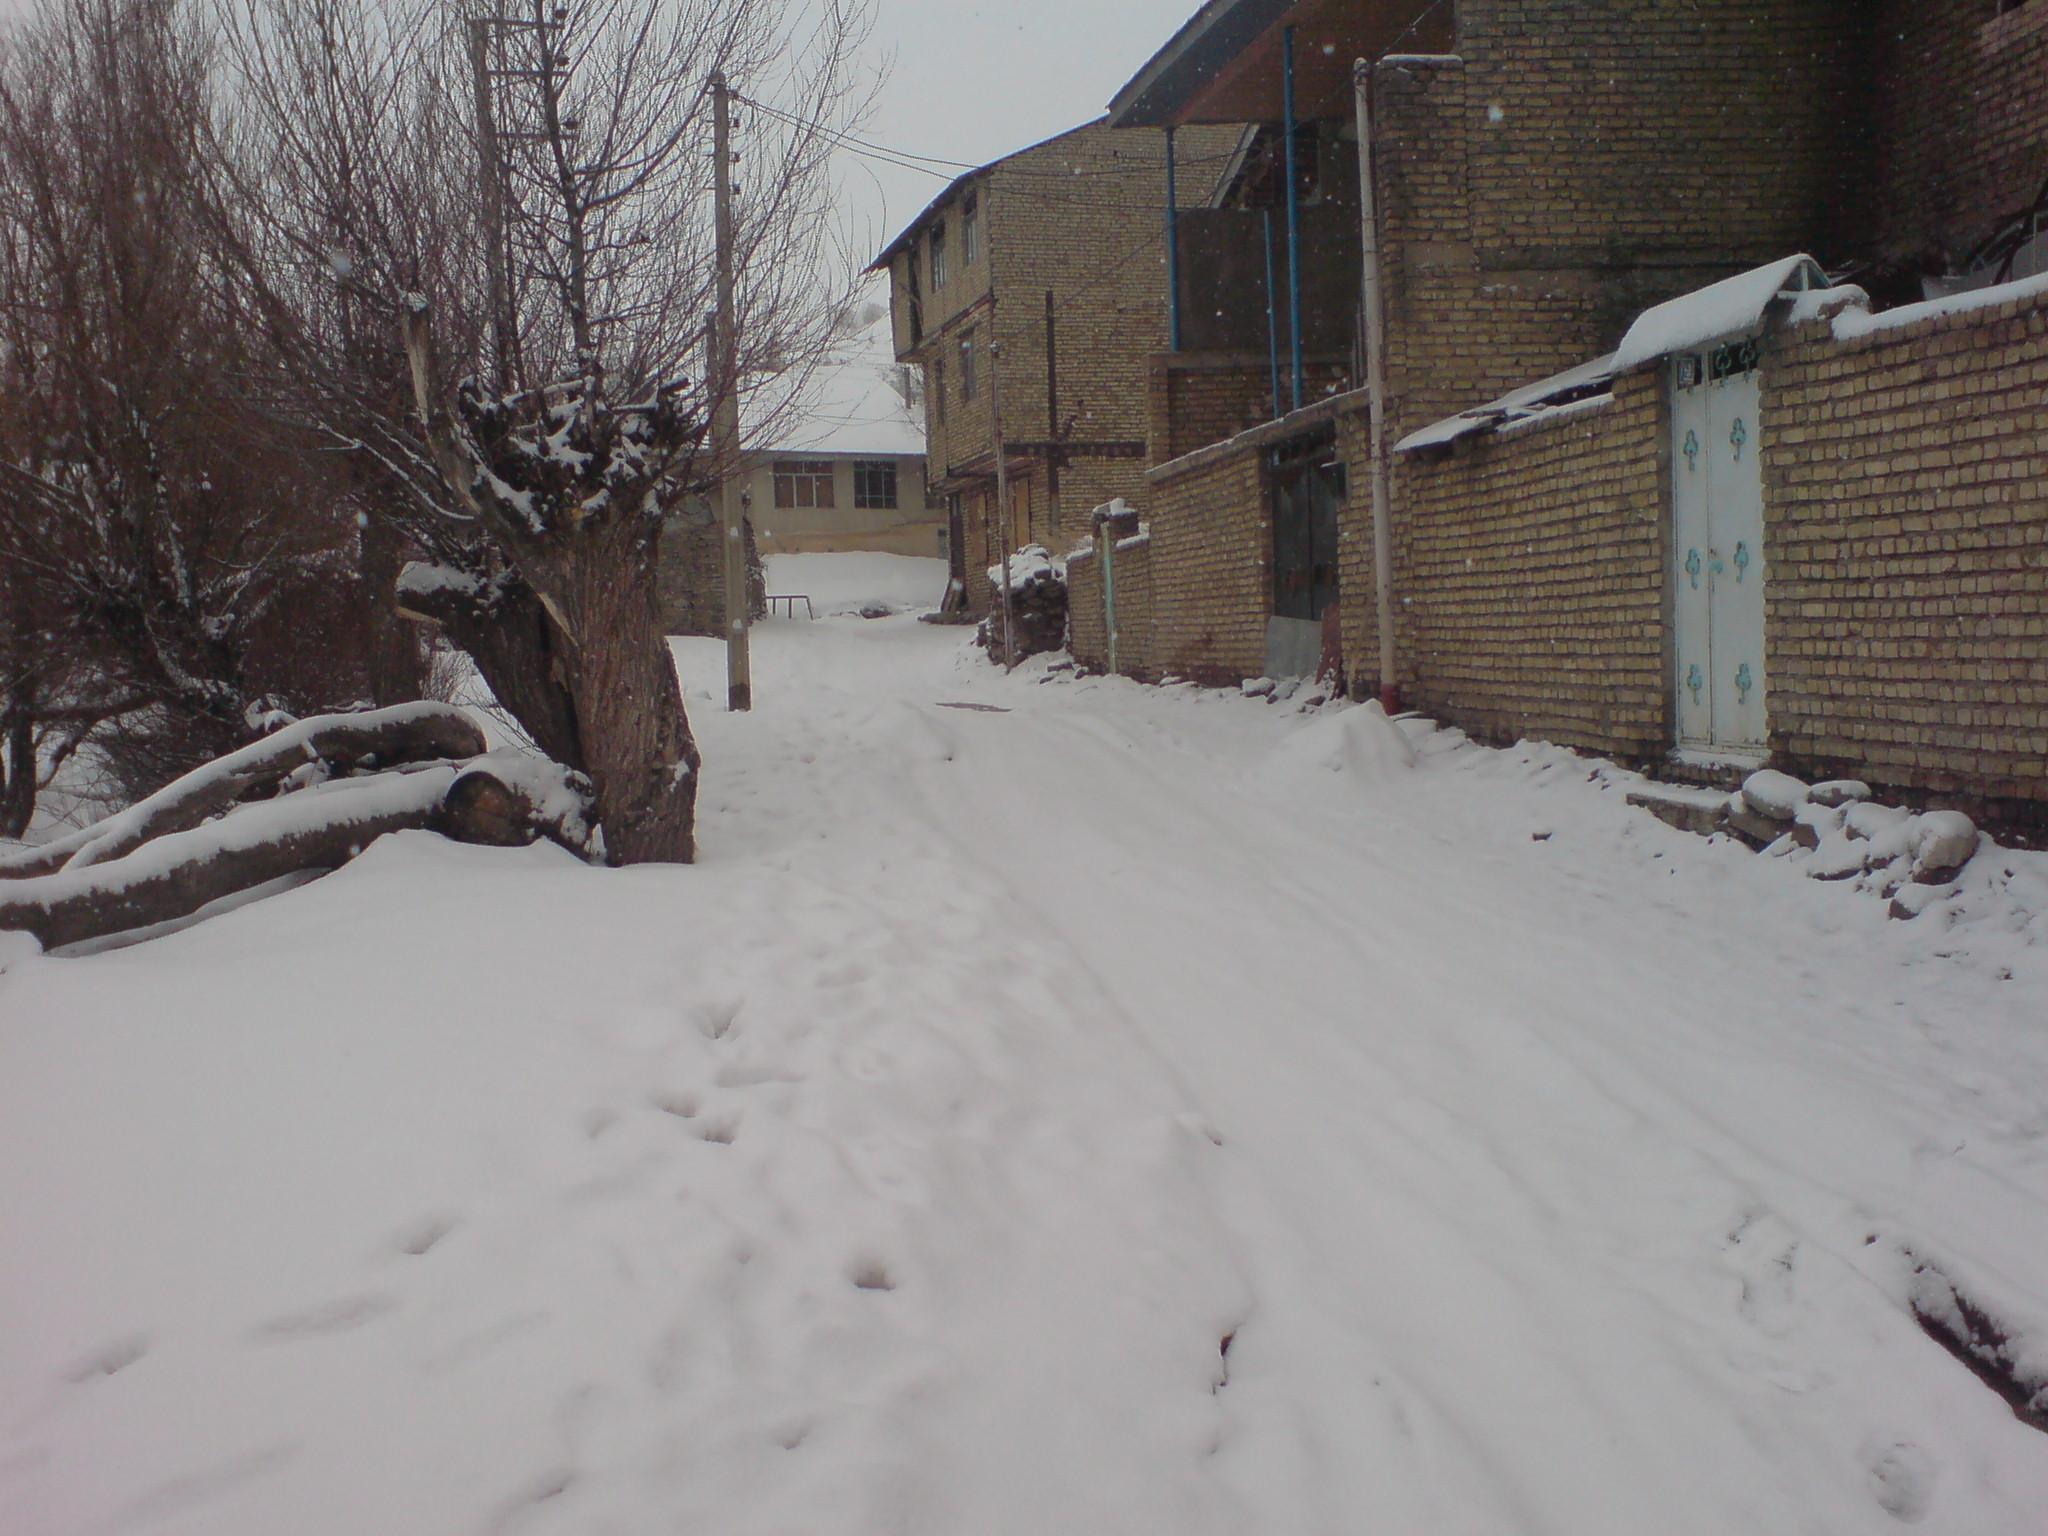 ۷۲ ساعت بارش مداوم برف در روستاي نسن نور